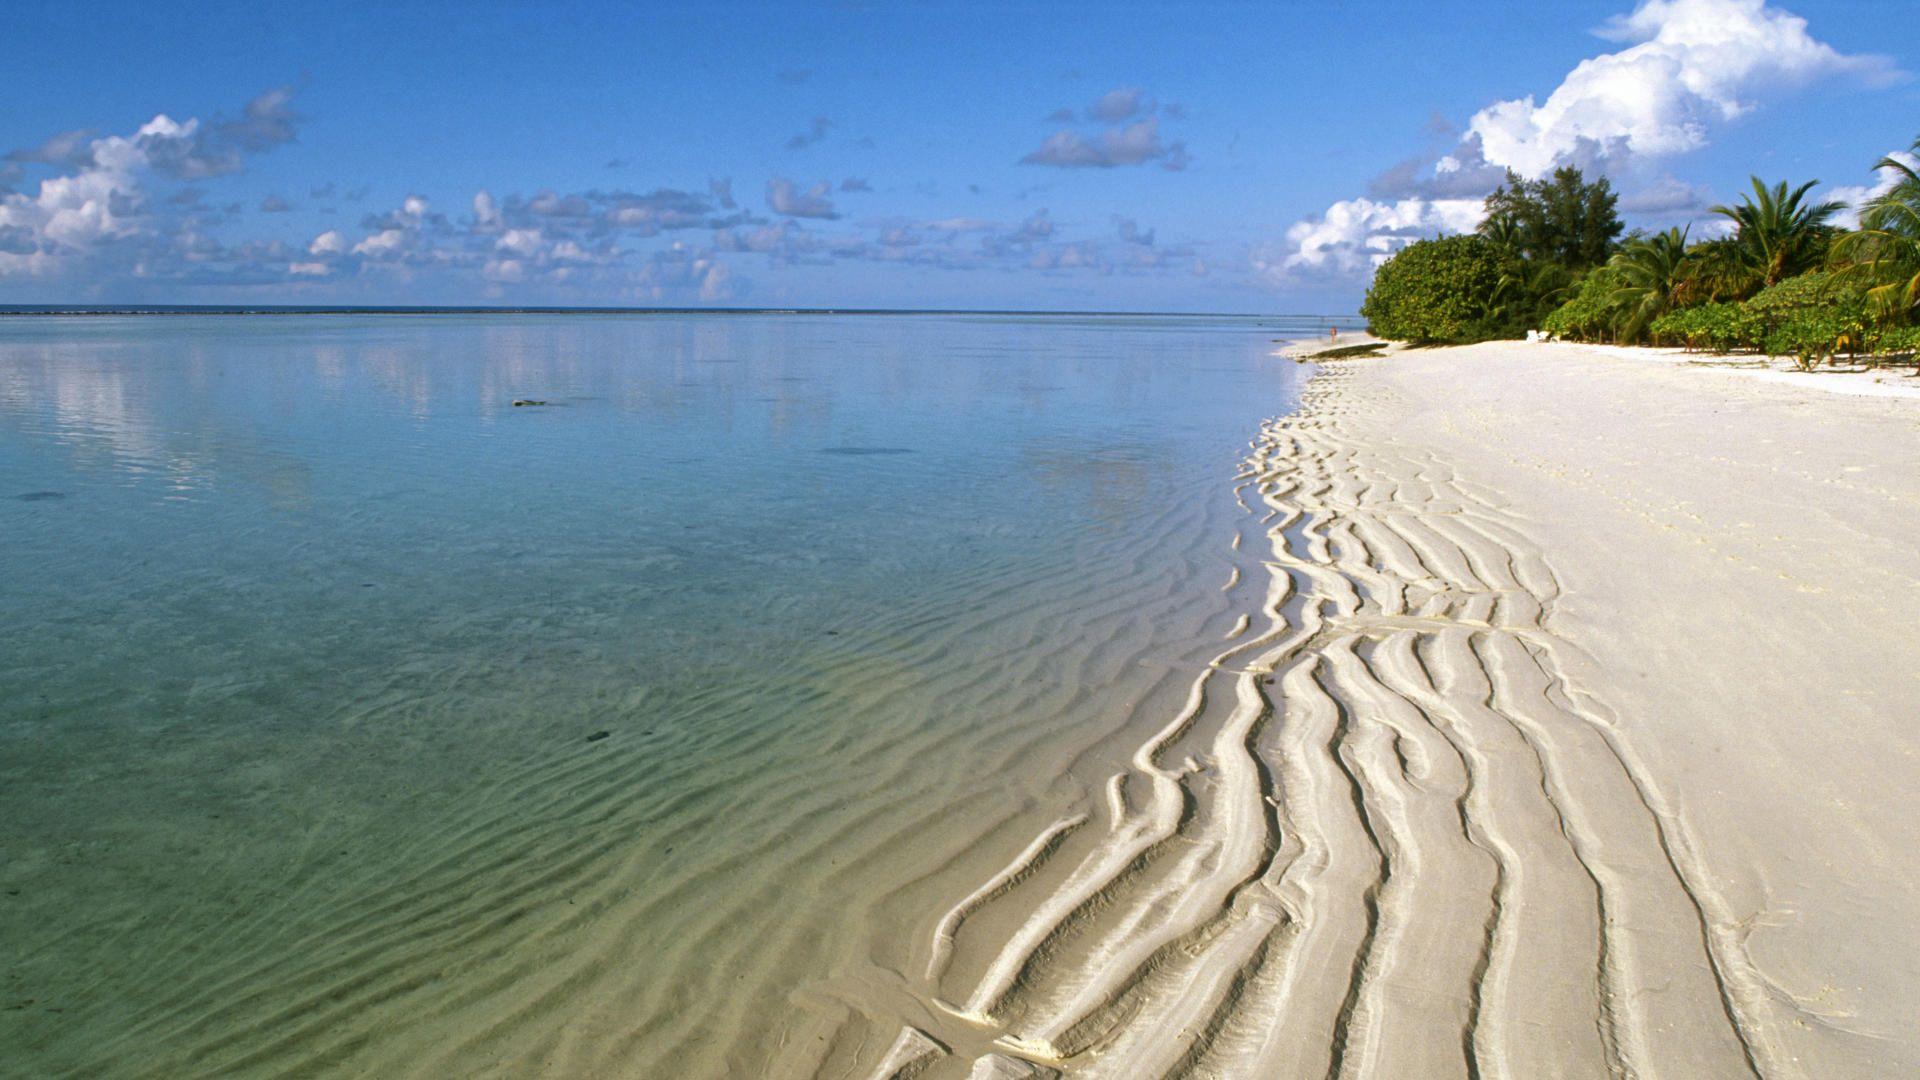 ostrova-goa-indiya